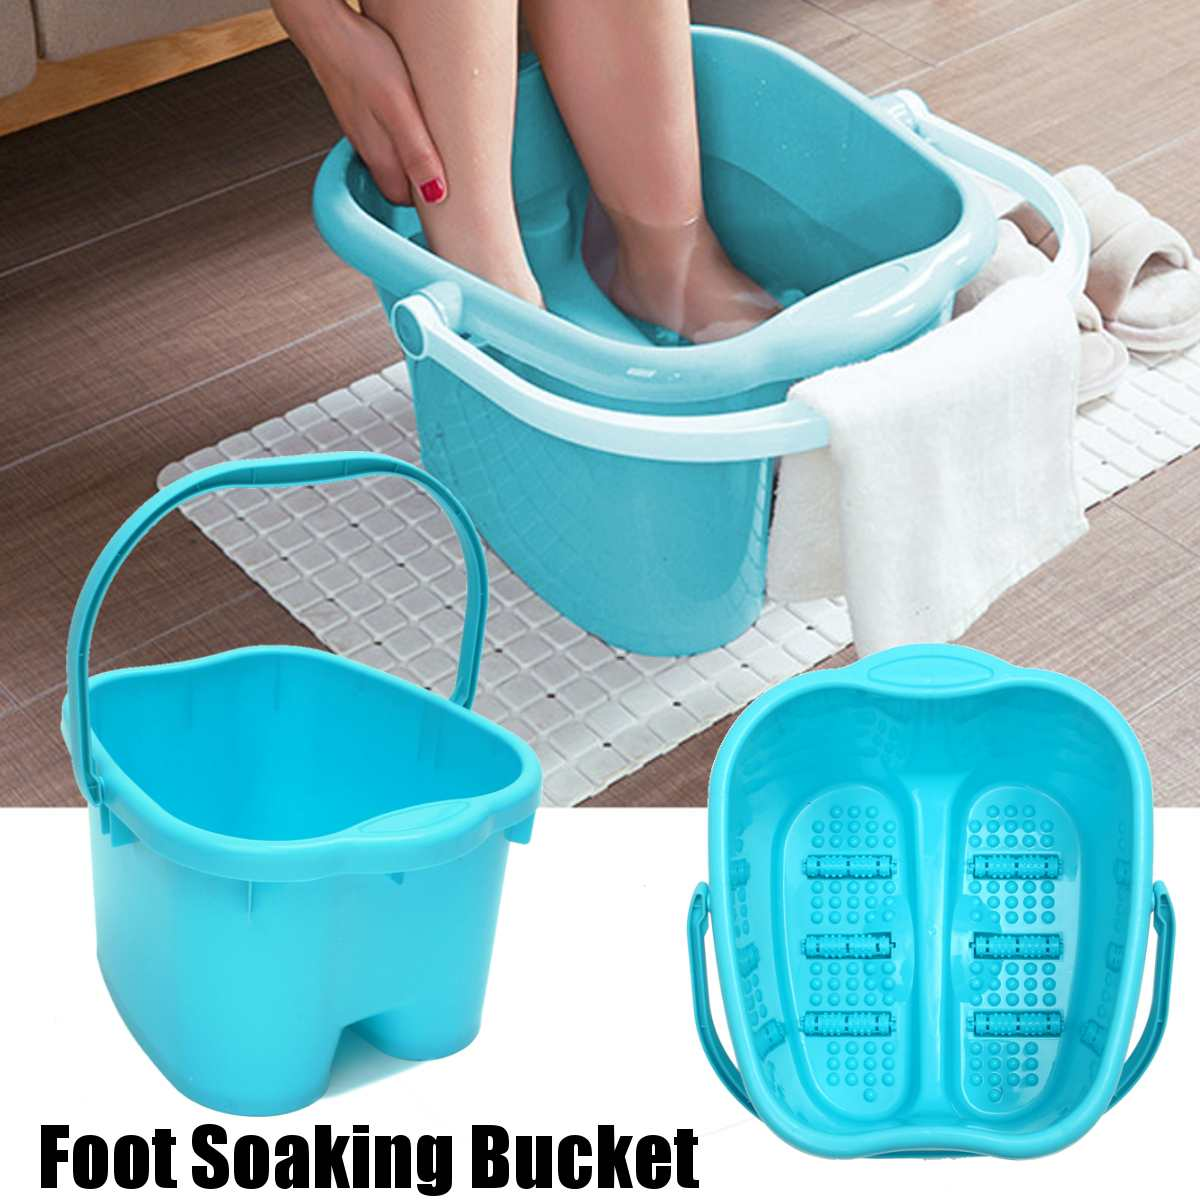 Foot Tub Portable Foot Wash Tub Massage Bucket Travel Bucket with 6 Massage Balls Bathing Feet in Winter